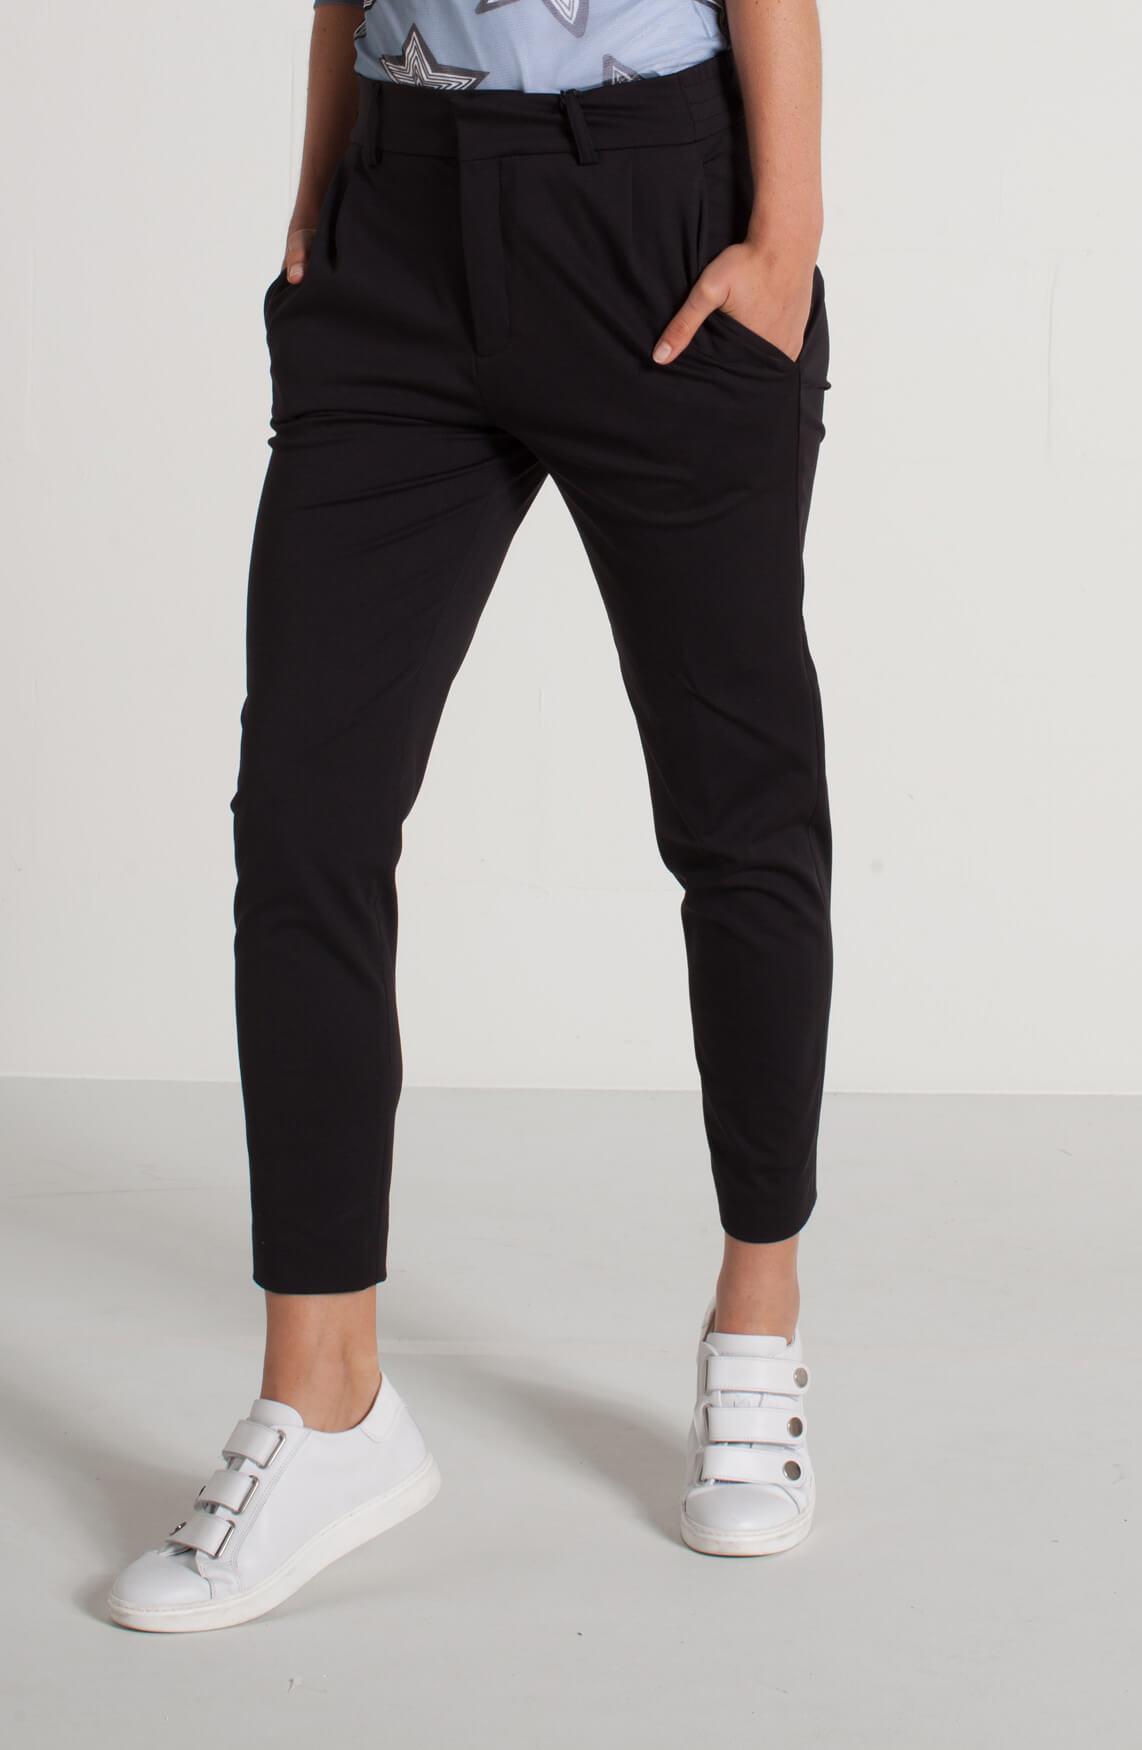 Drykorn Dames Find casual pantalon zwart